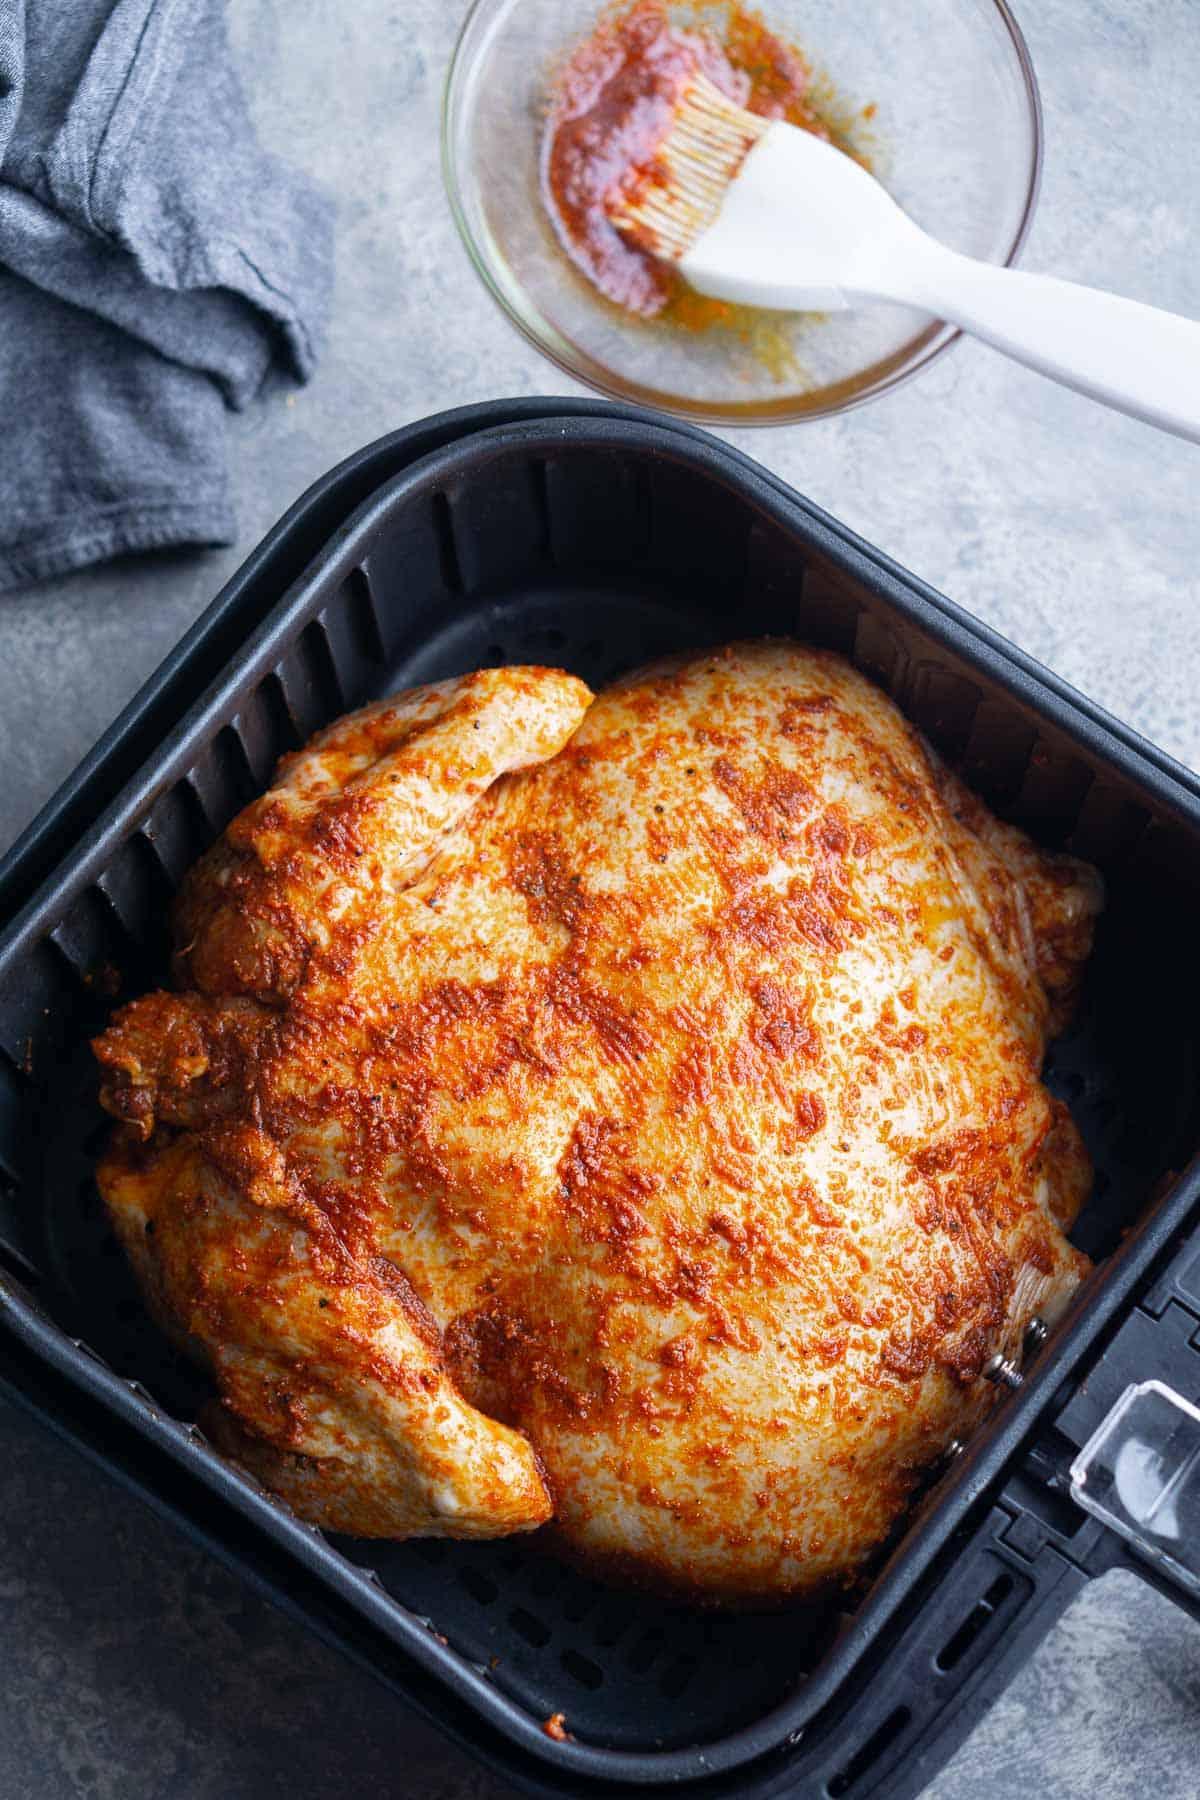 whole seasoned uncooked chicken in air fryer basket